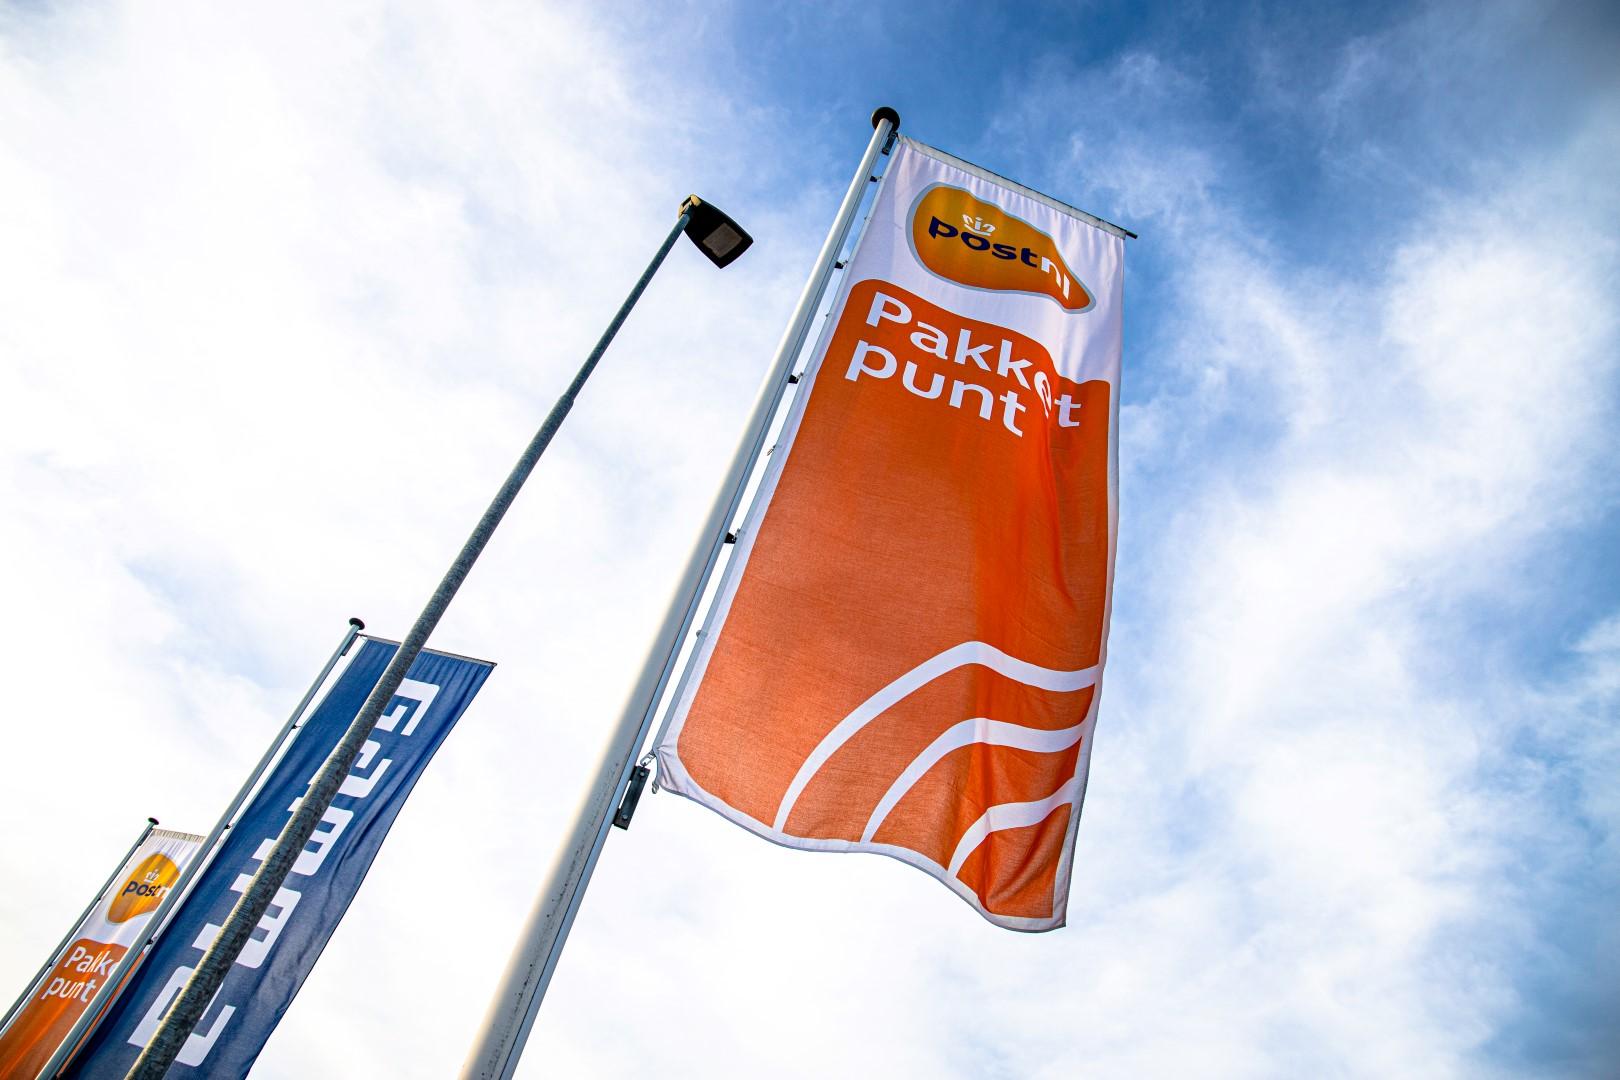 bouwmarkt klussen gamma moerweg vlag post pick up pakket punt postnl